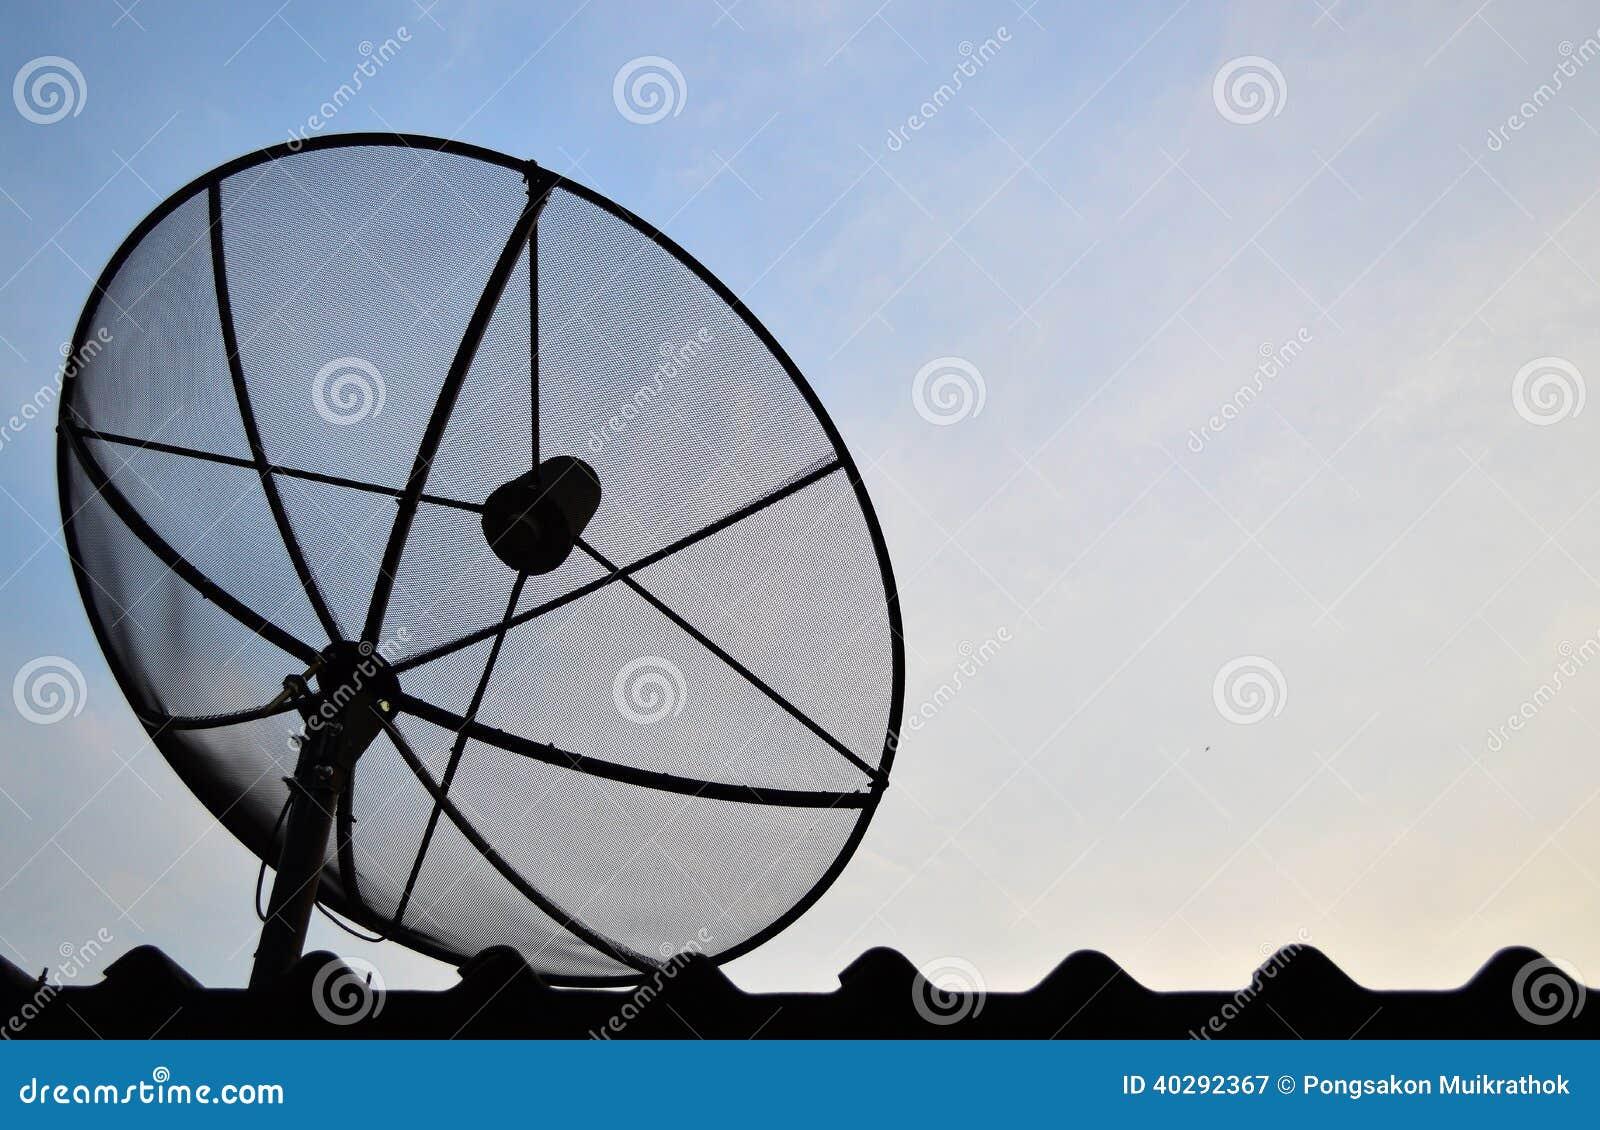 Спутниковая антенна-тарелка спутника связи антенны